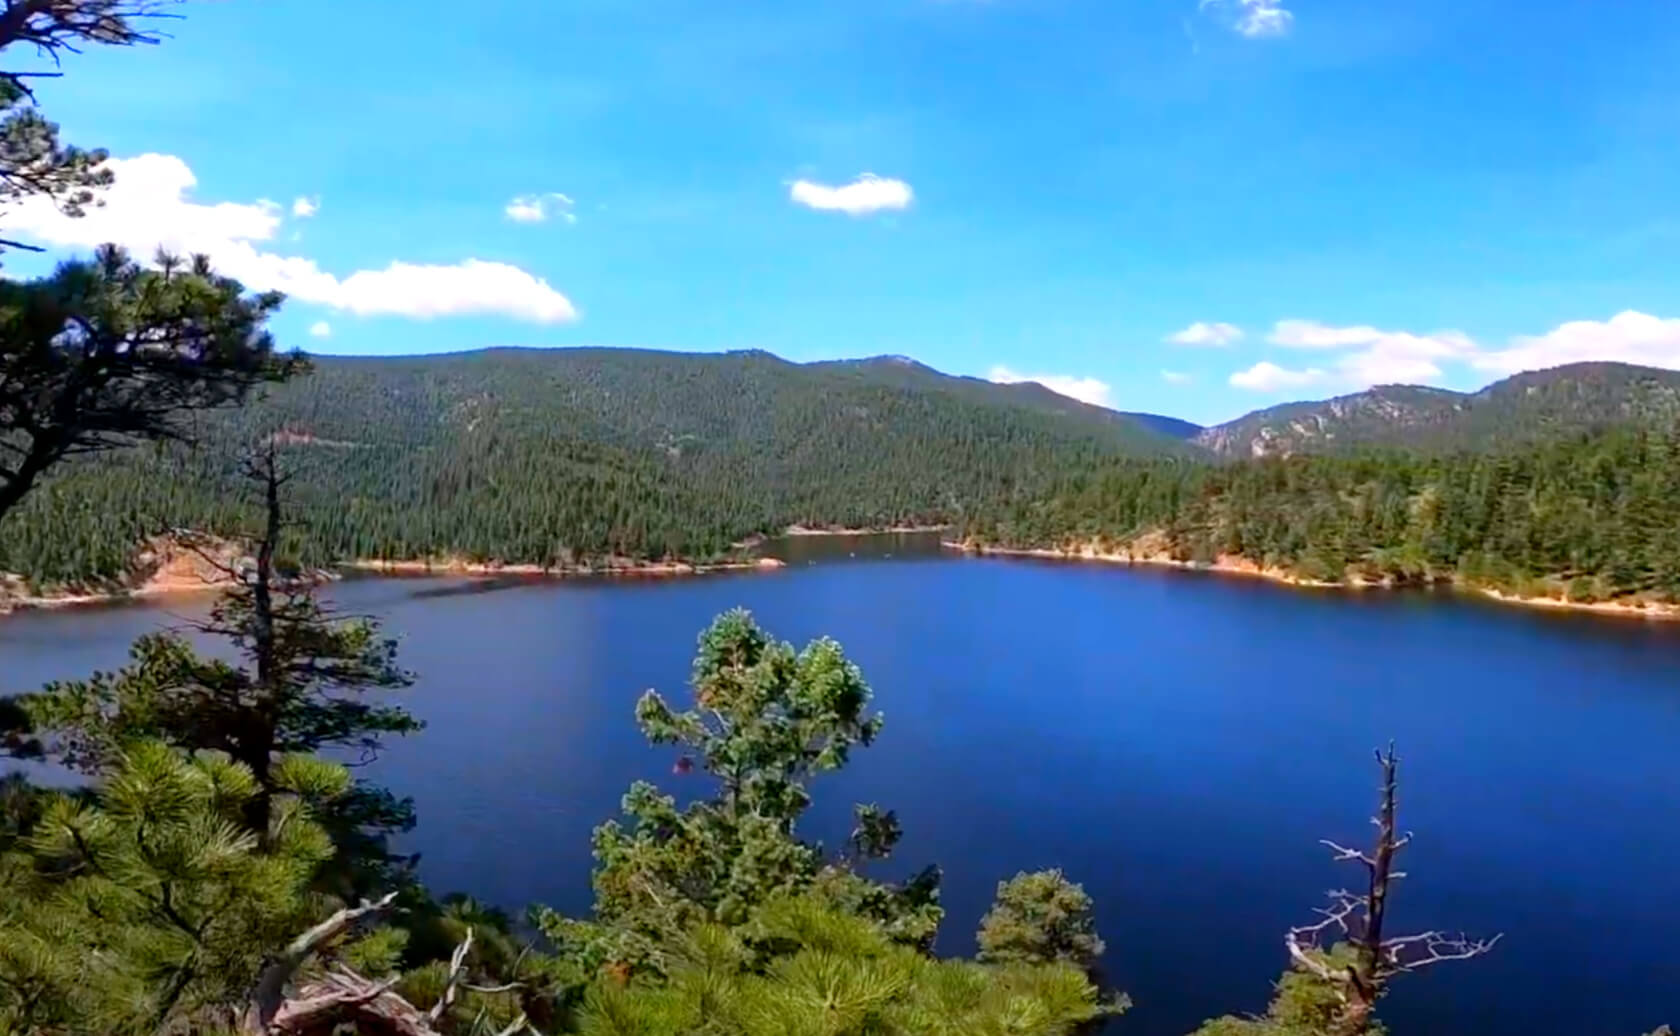 Gross-Lake-Fishing-Guide-Report-Colorado-04